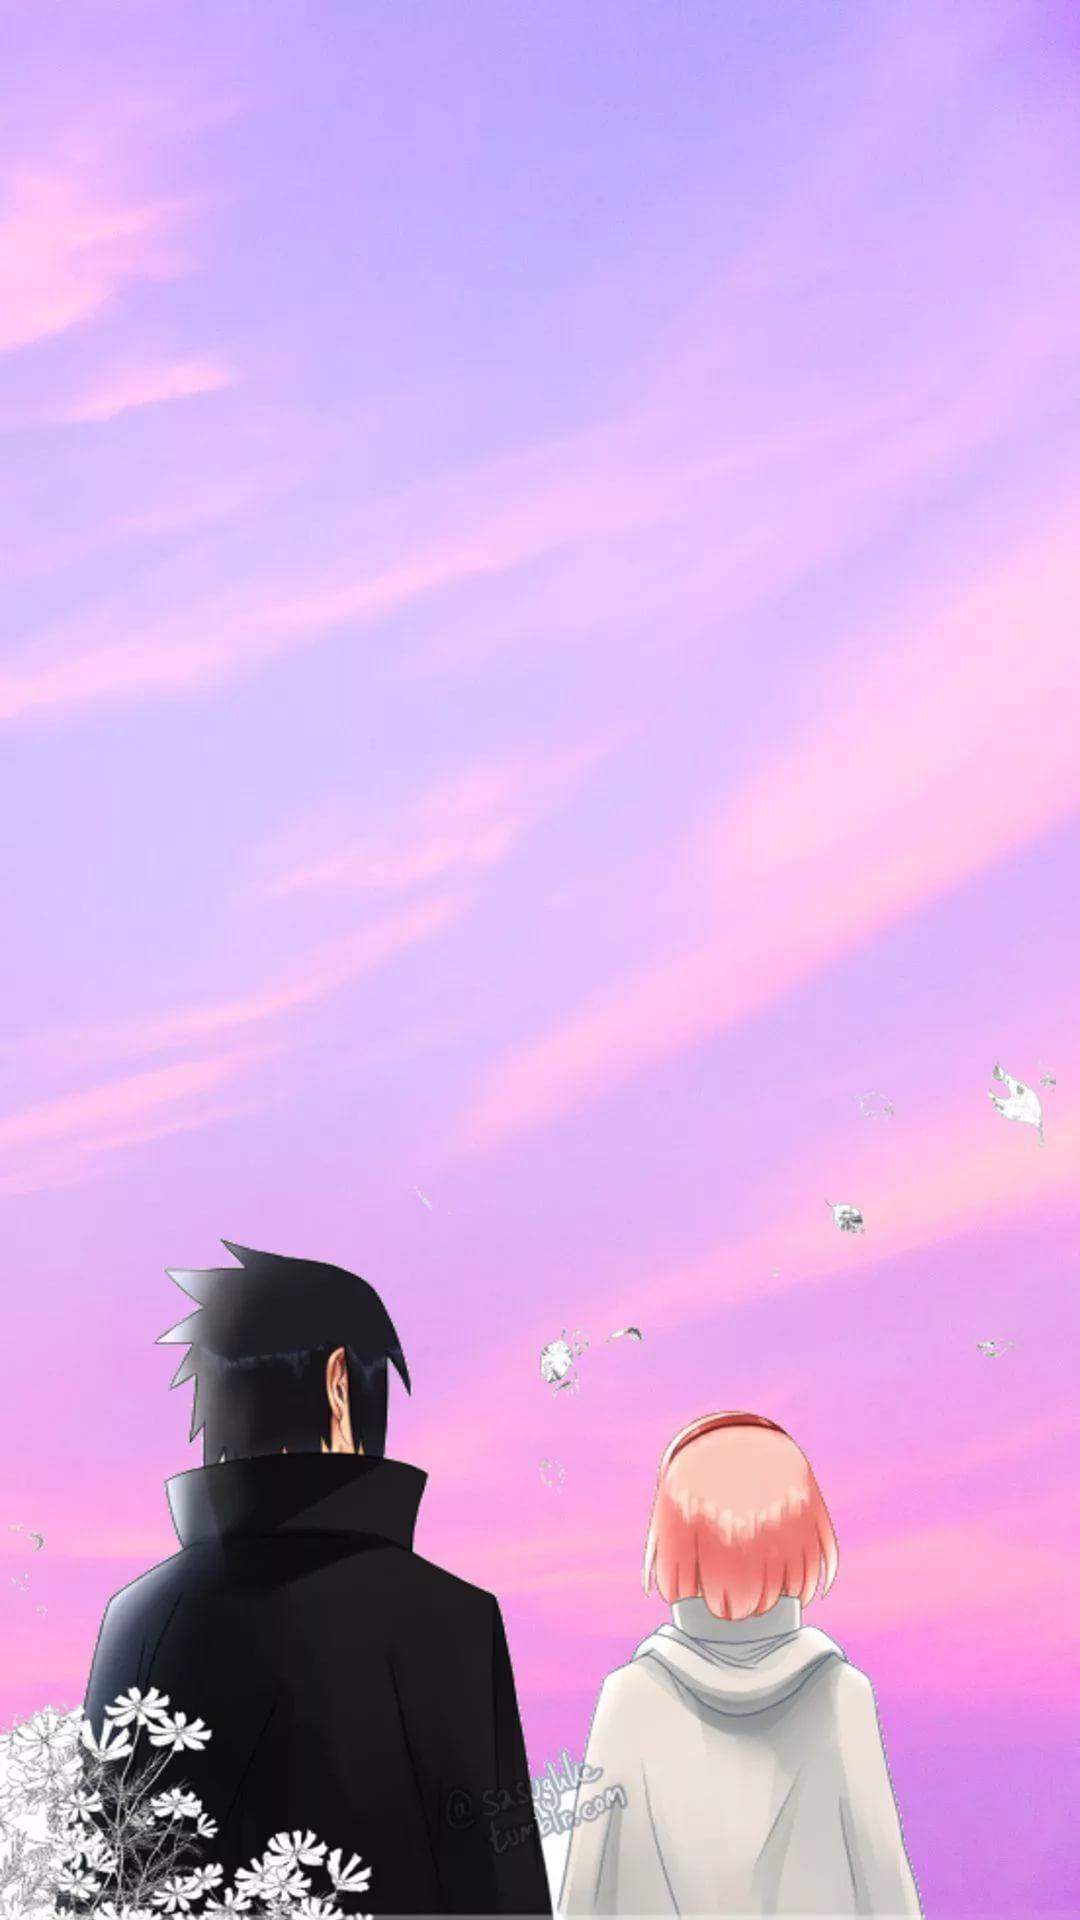 Sasuke Samsung Galaxy s8 wallpaper